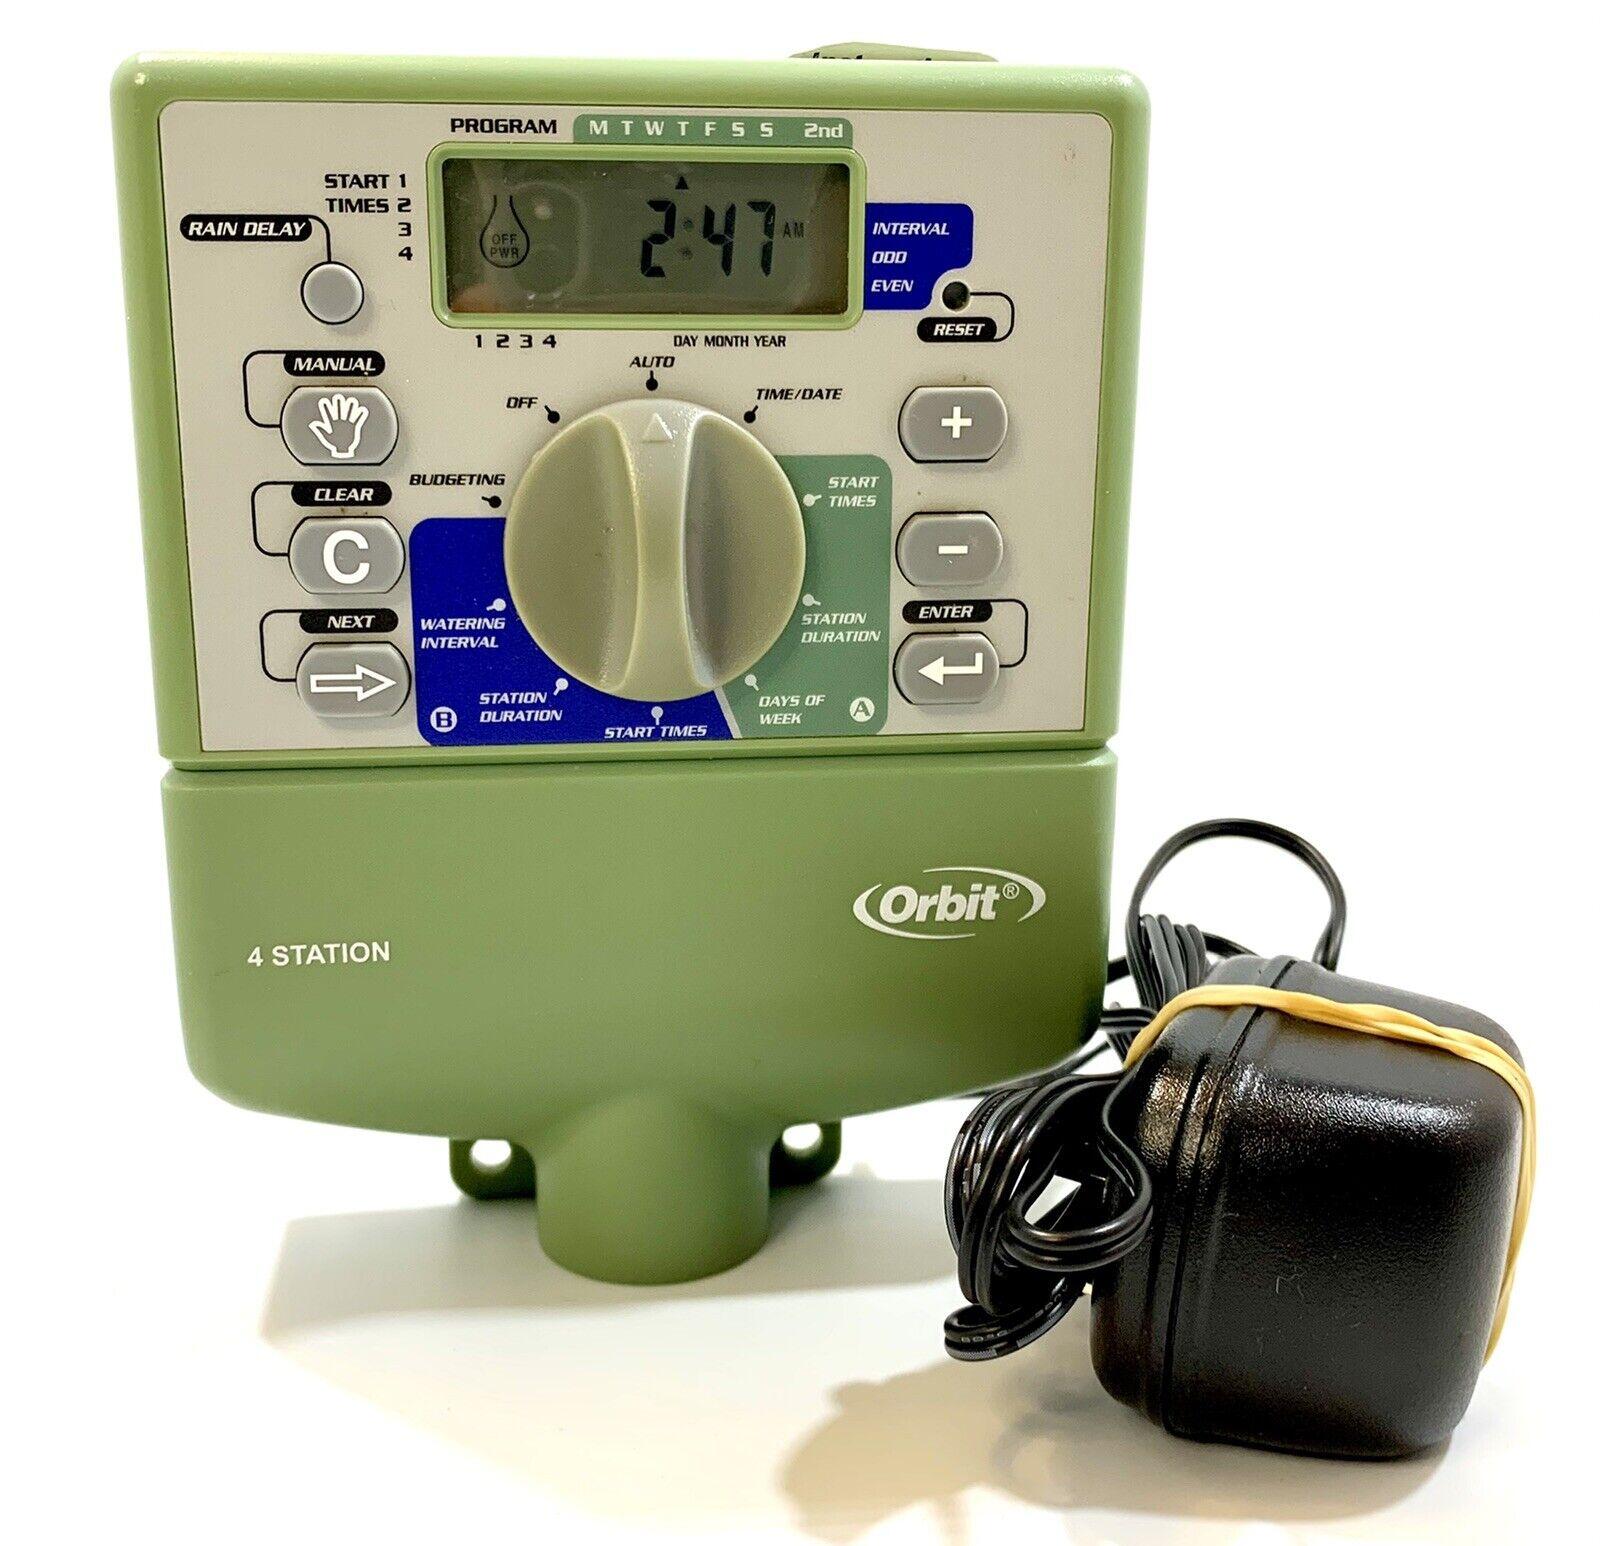 Orbit Model 57194 - WT2Y Sprinkler Timer 4 Stations W/ AC Adaptor Tested Working